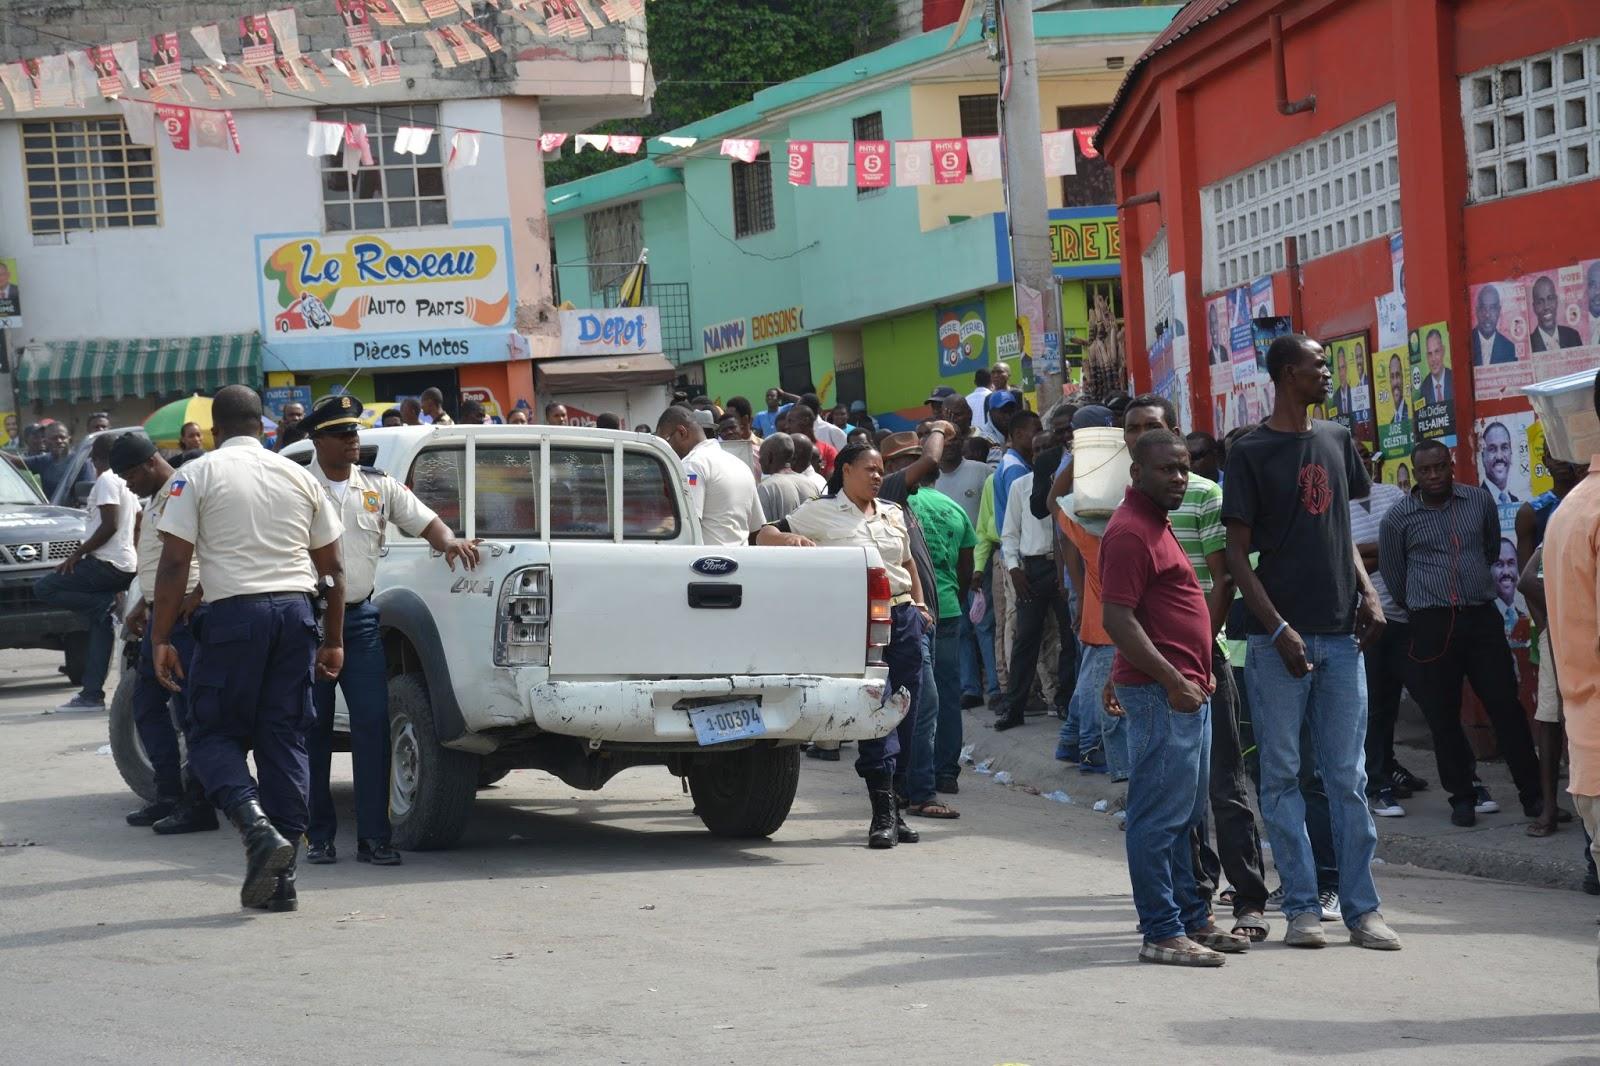 Haiti coram deo election day canape vert for Canape vert hospital haiti